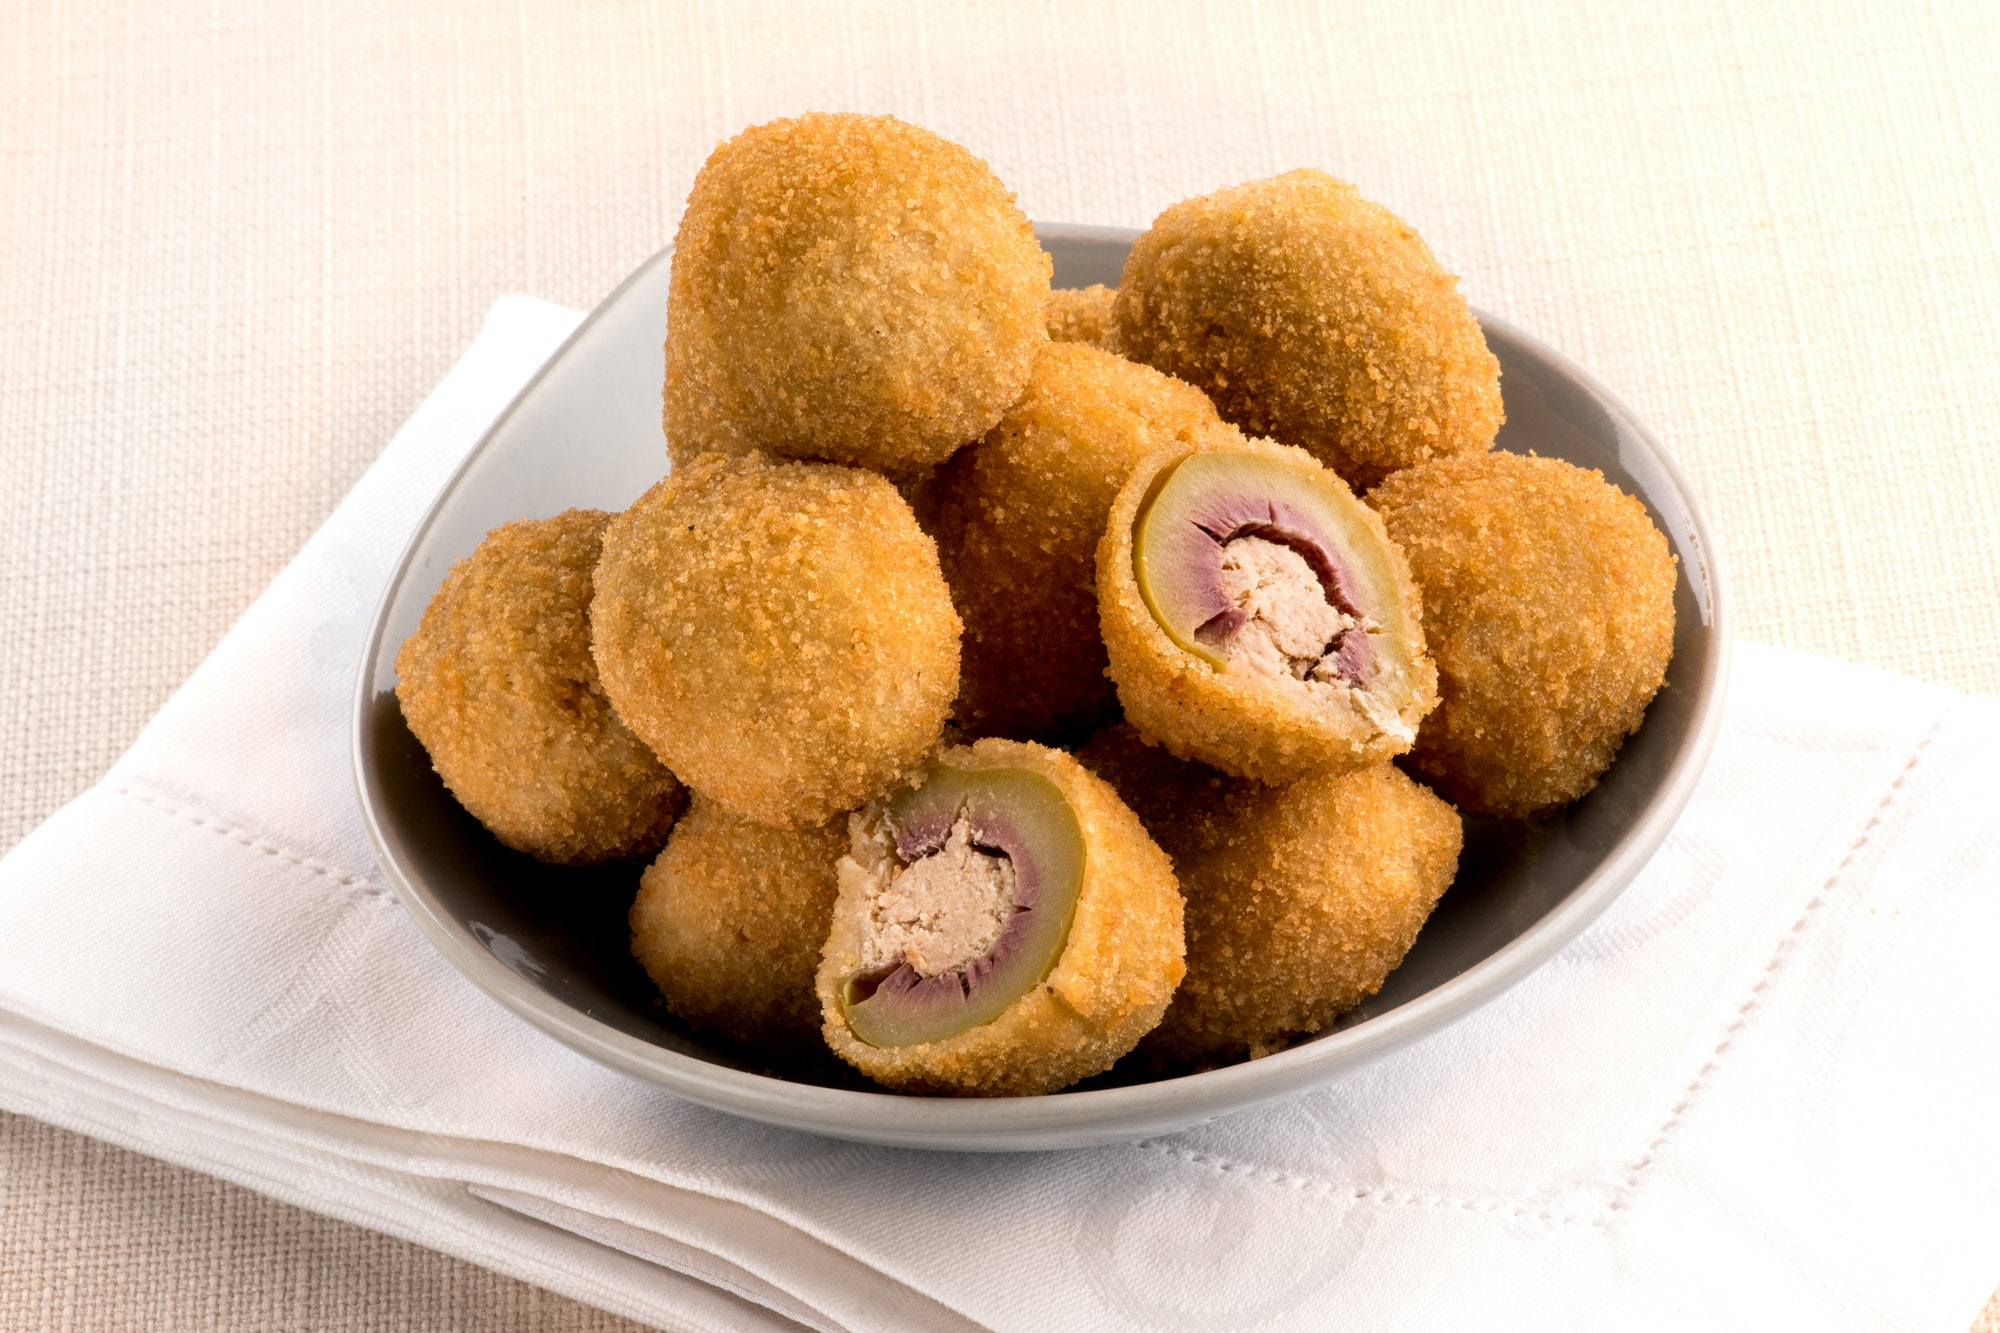 Olive ascolane, or deep fried stuffed olives